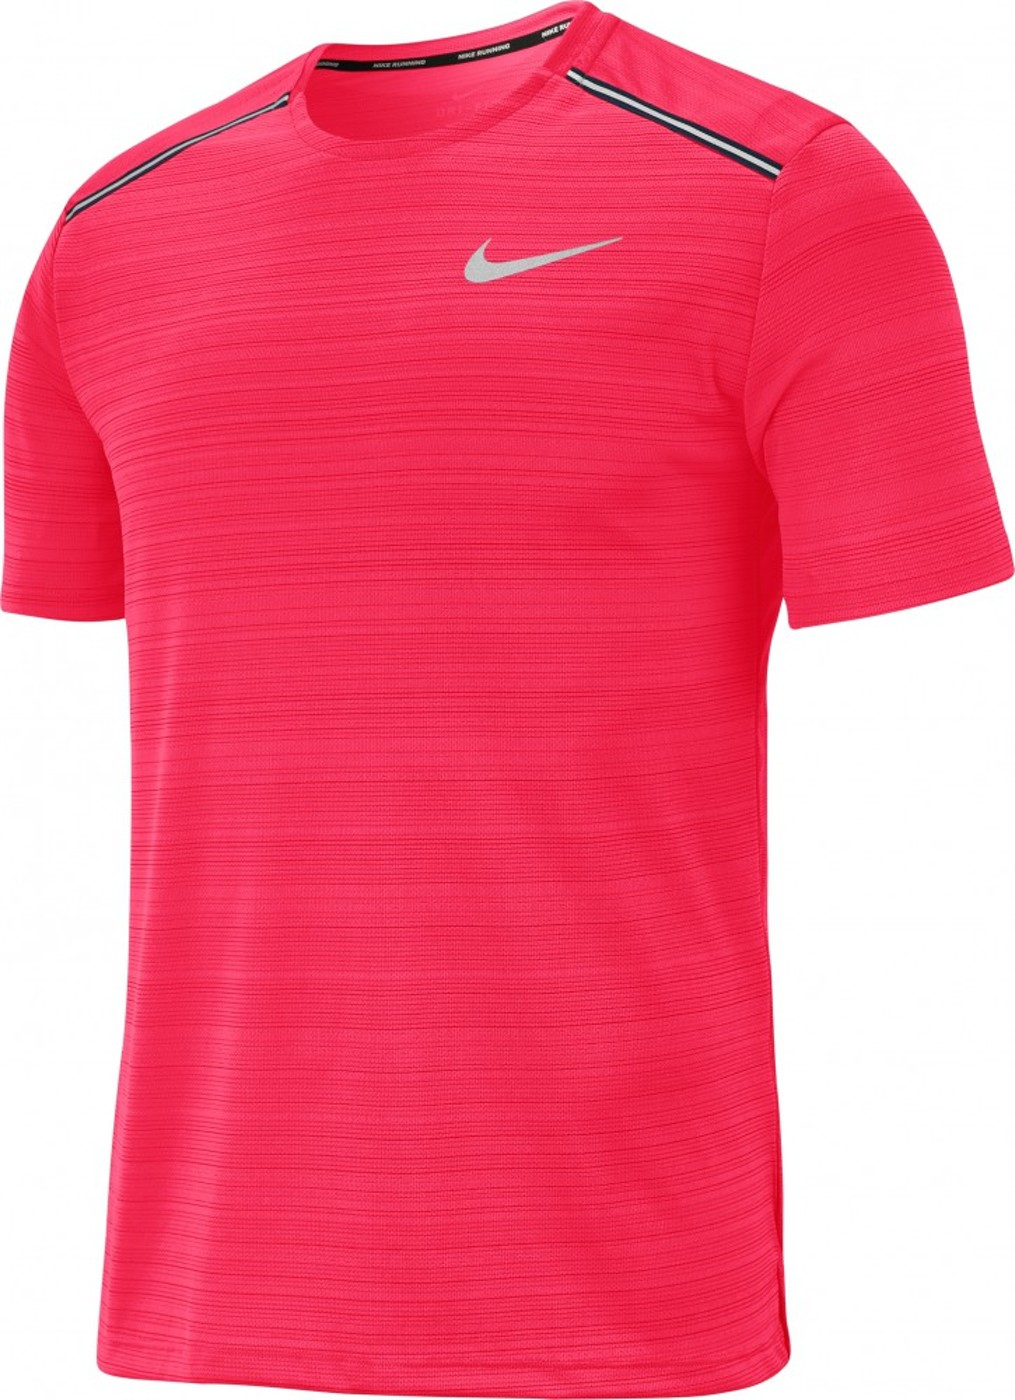 Nike Dri-FIT Miler Short - Herren